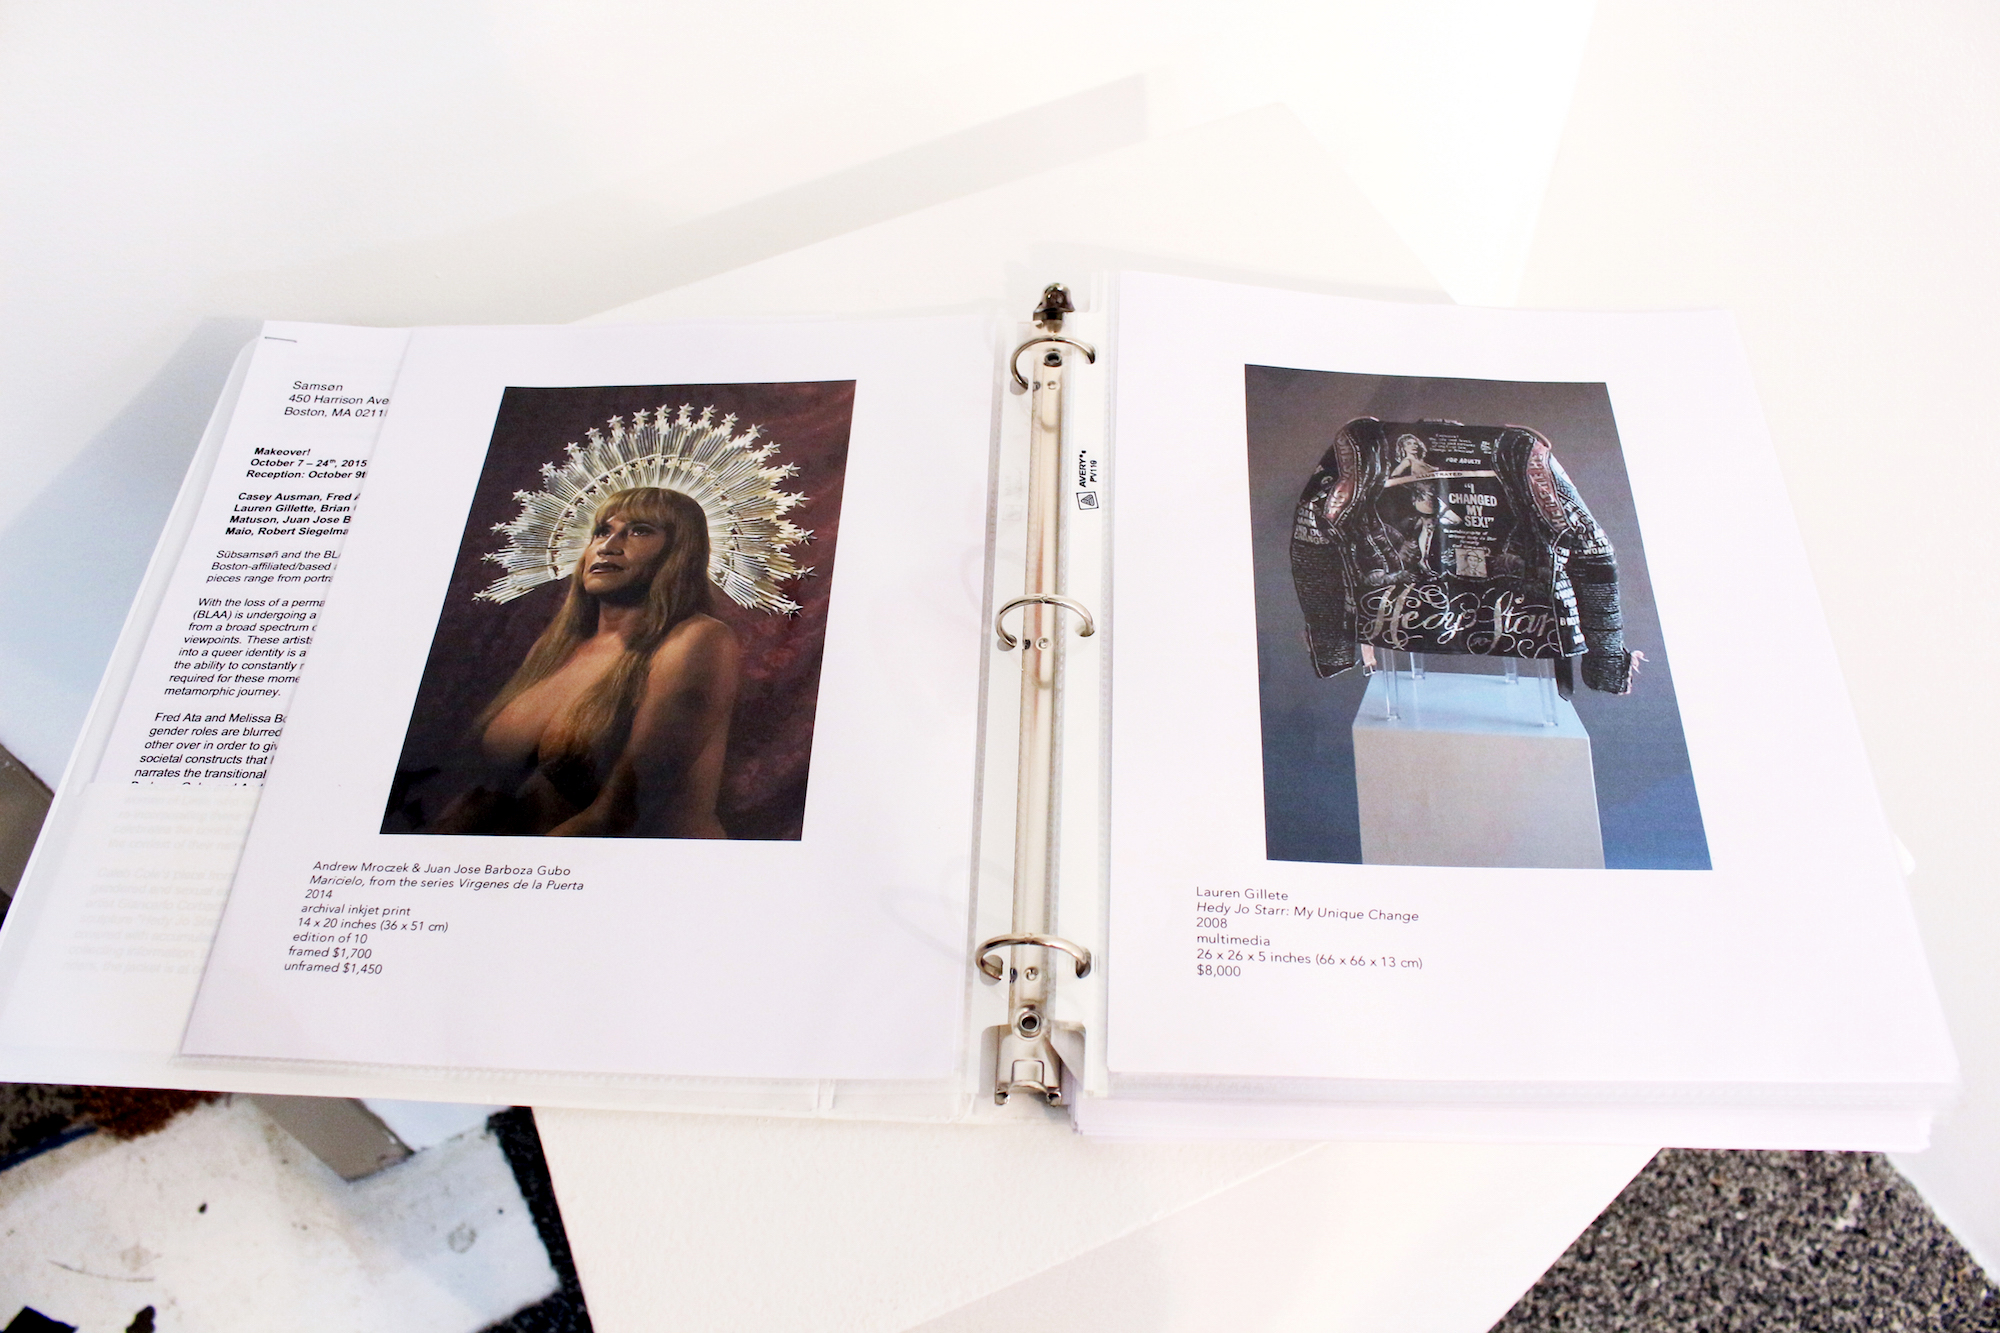 BLAA x Subsamson Makeover! show portfolio, featuring works of (left) Andrew Mroczek and Juan Jose Barboza Gubo, and (right) Lauren Gillette.